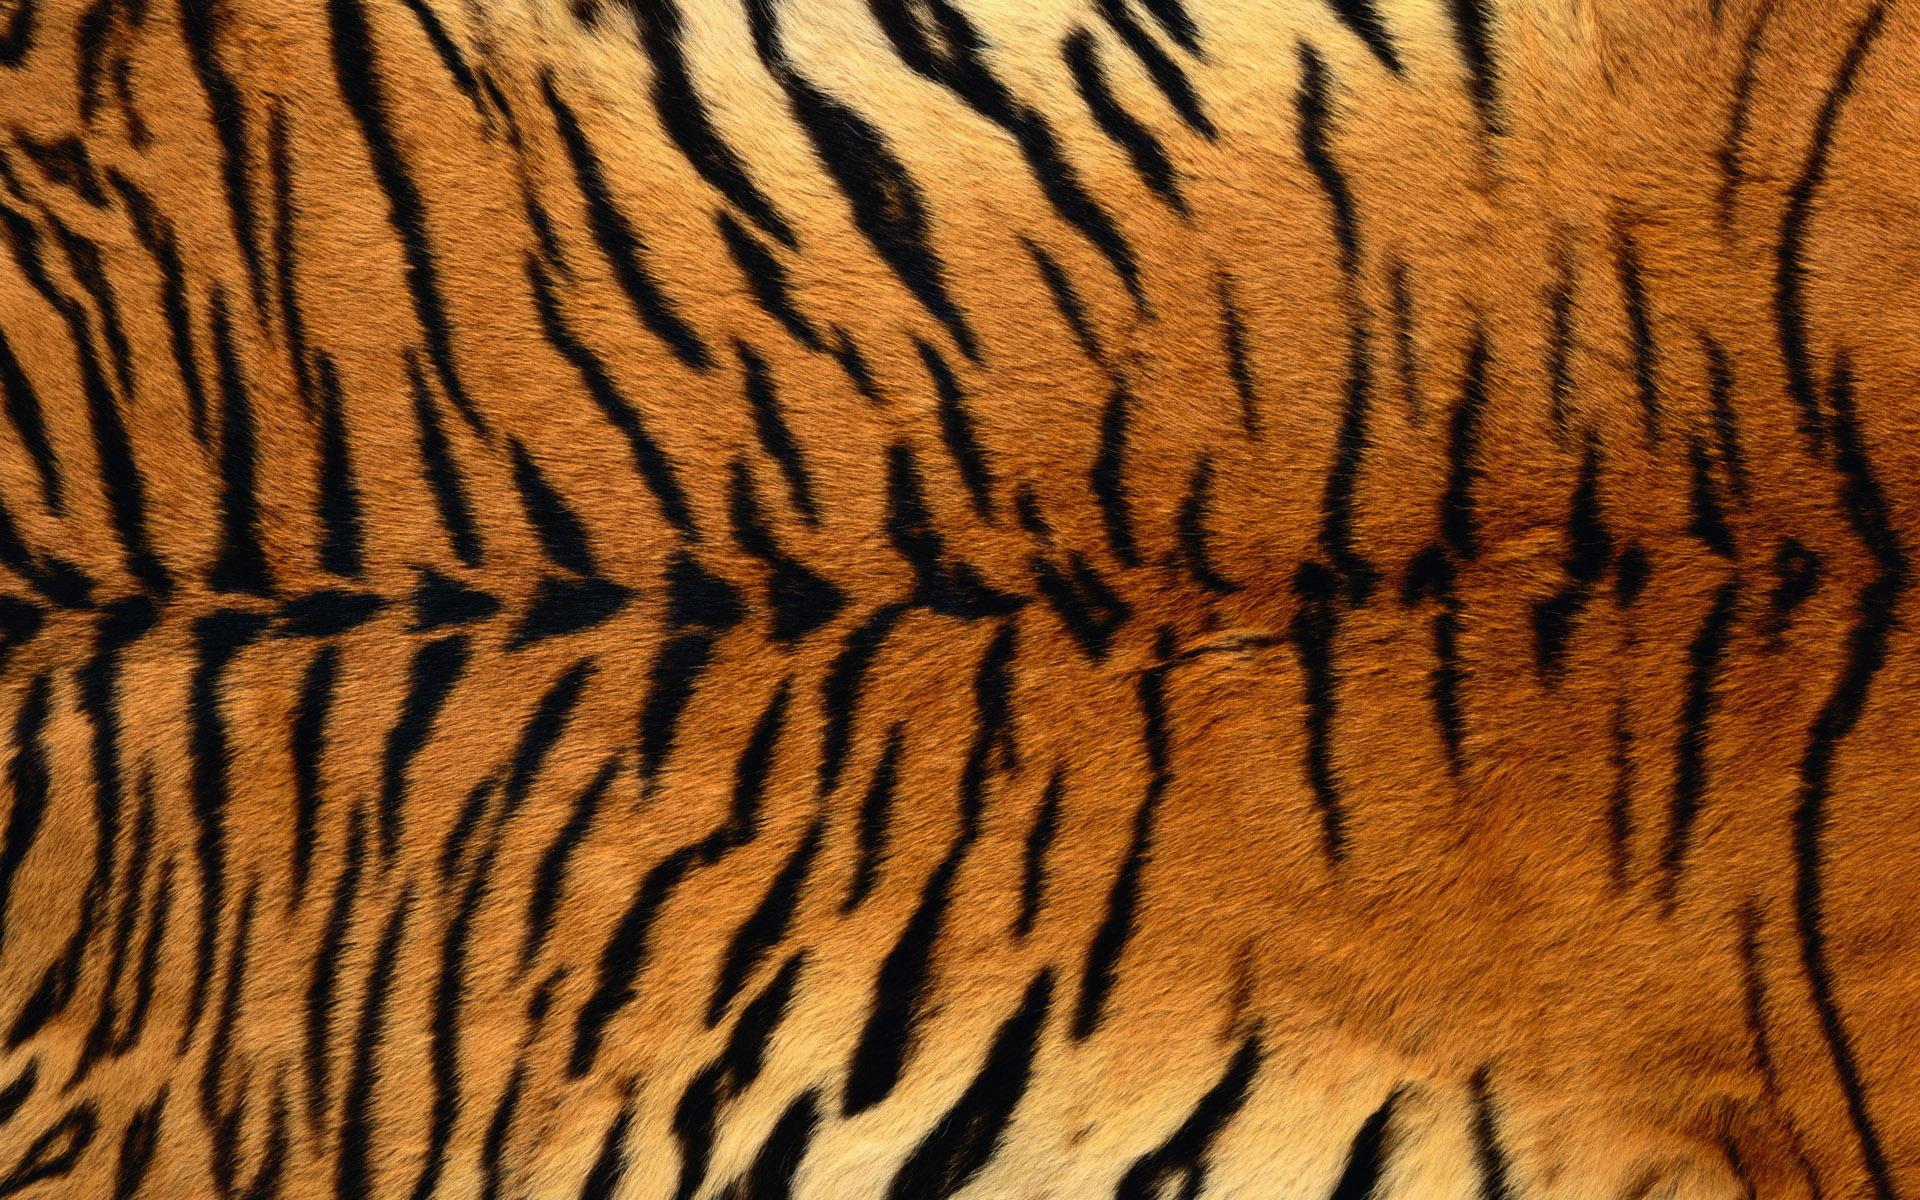 спина тигра, шкура тигра, фото, обои для рабочего стола, текстура